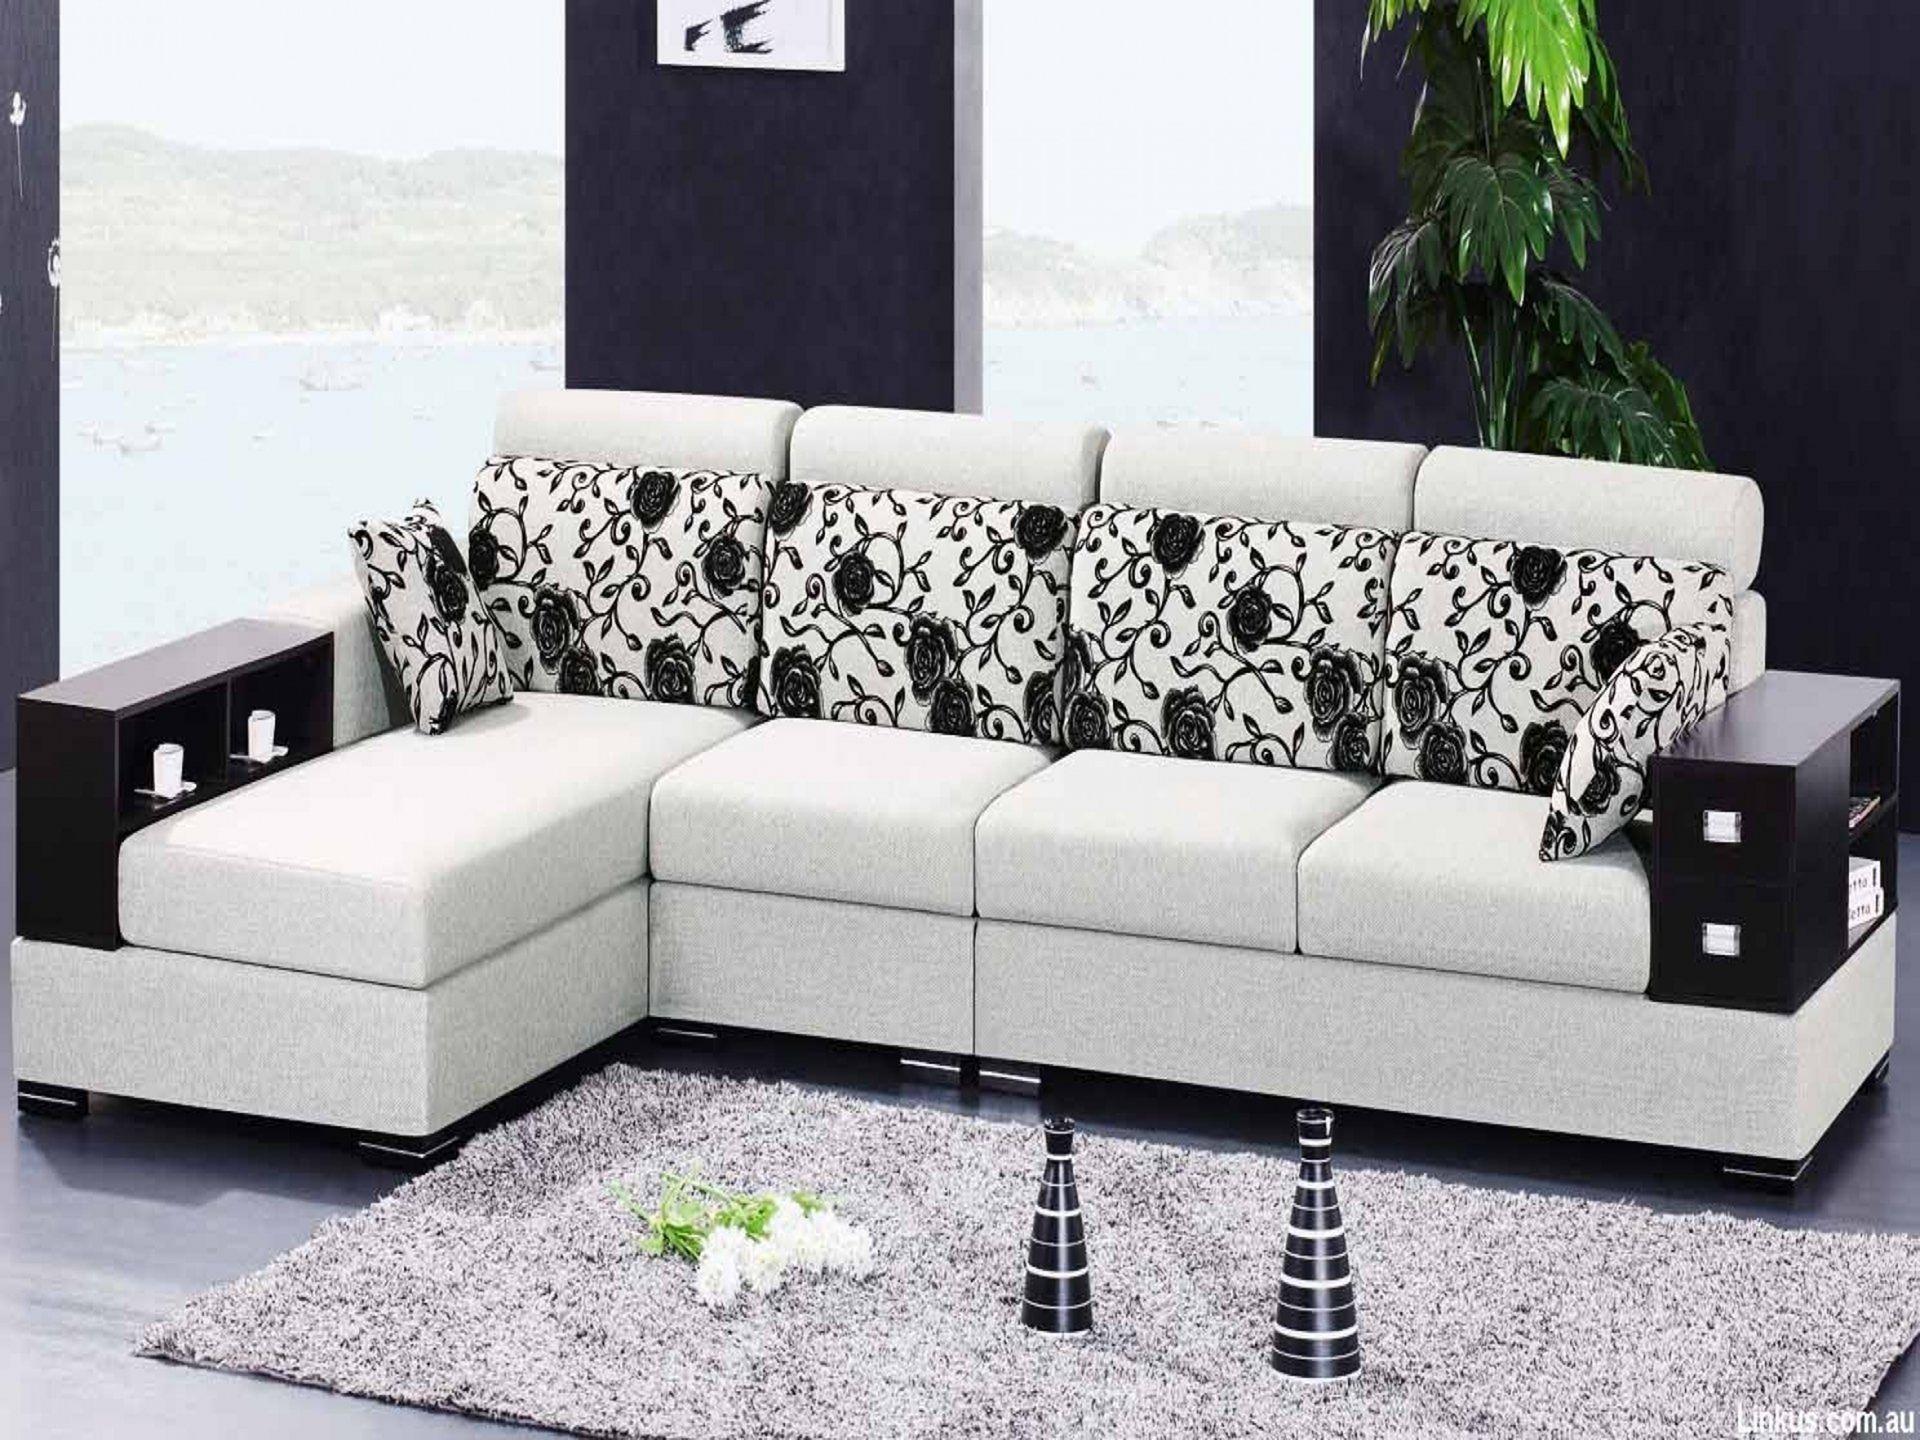 10 Stunning L Shaped Sofa Design Ideas Make Your Living Room Comfortable Corner Sofa Design Sofa Design Sofa Set Designs